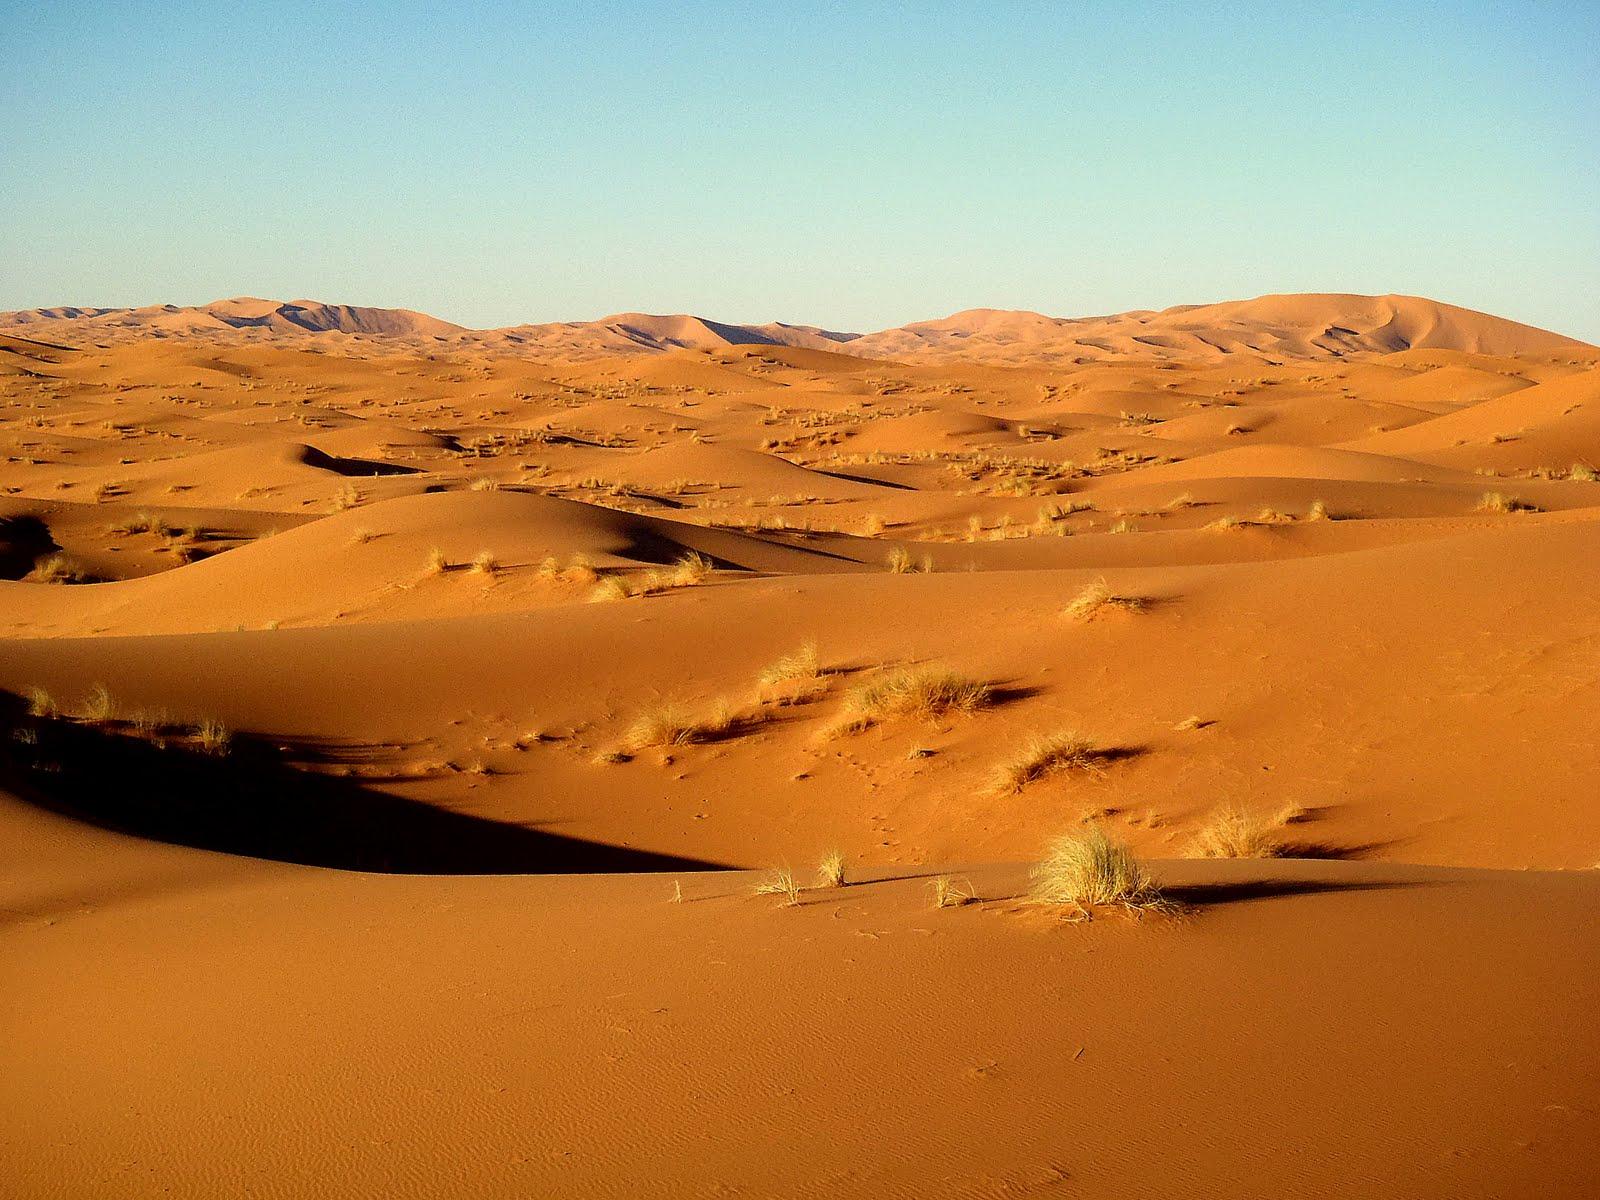 Sahara clipart saudi arabia #10